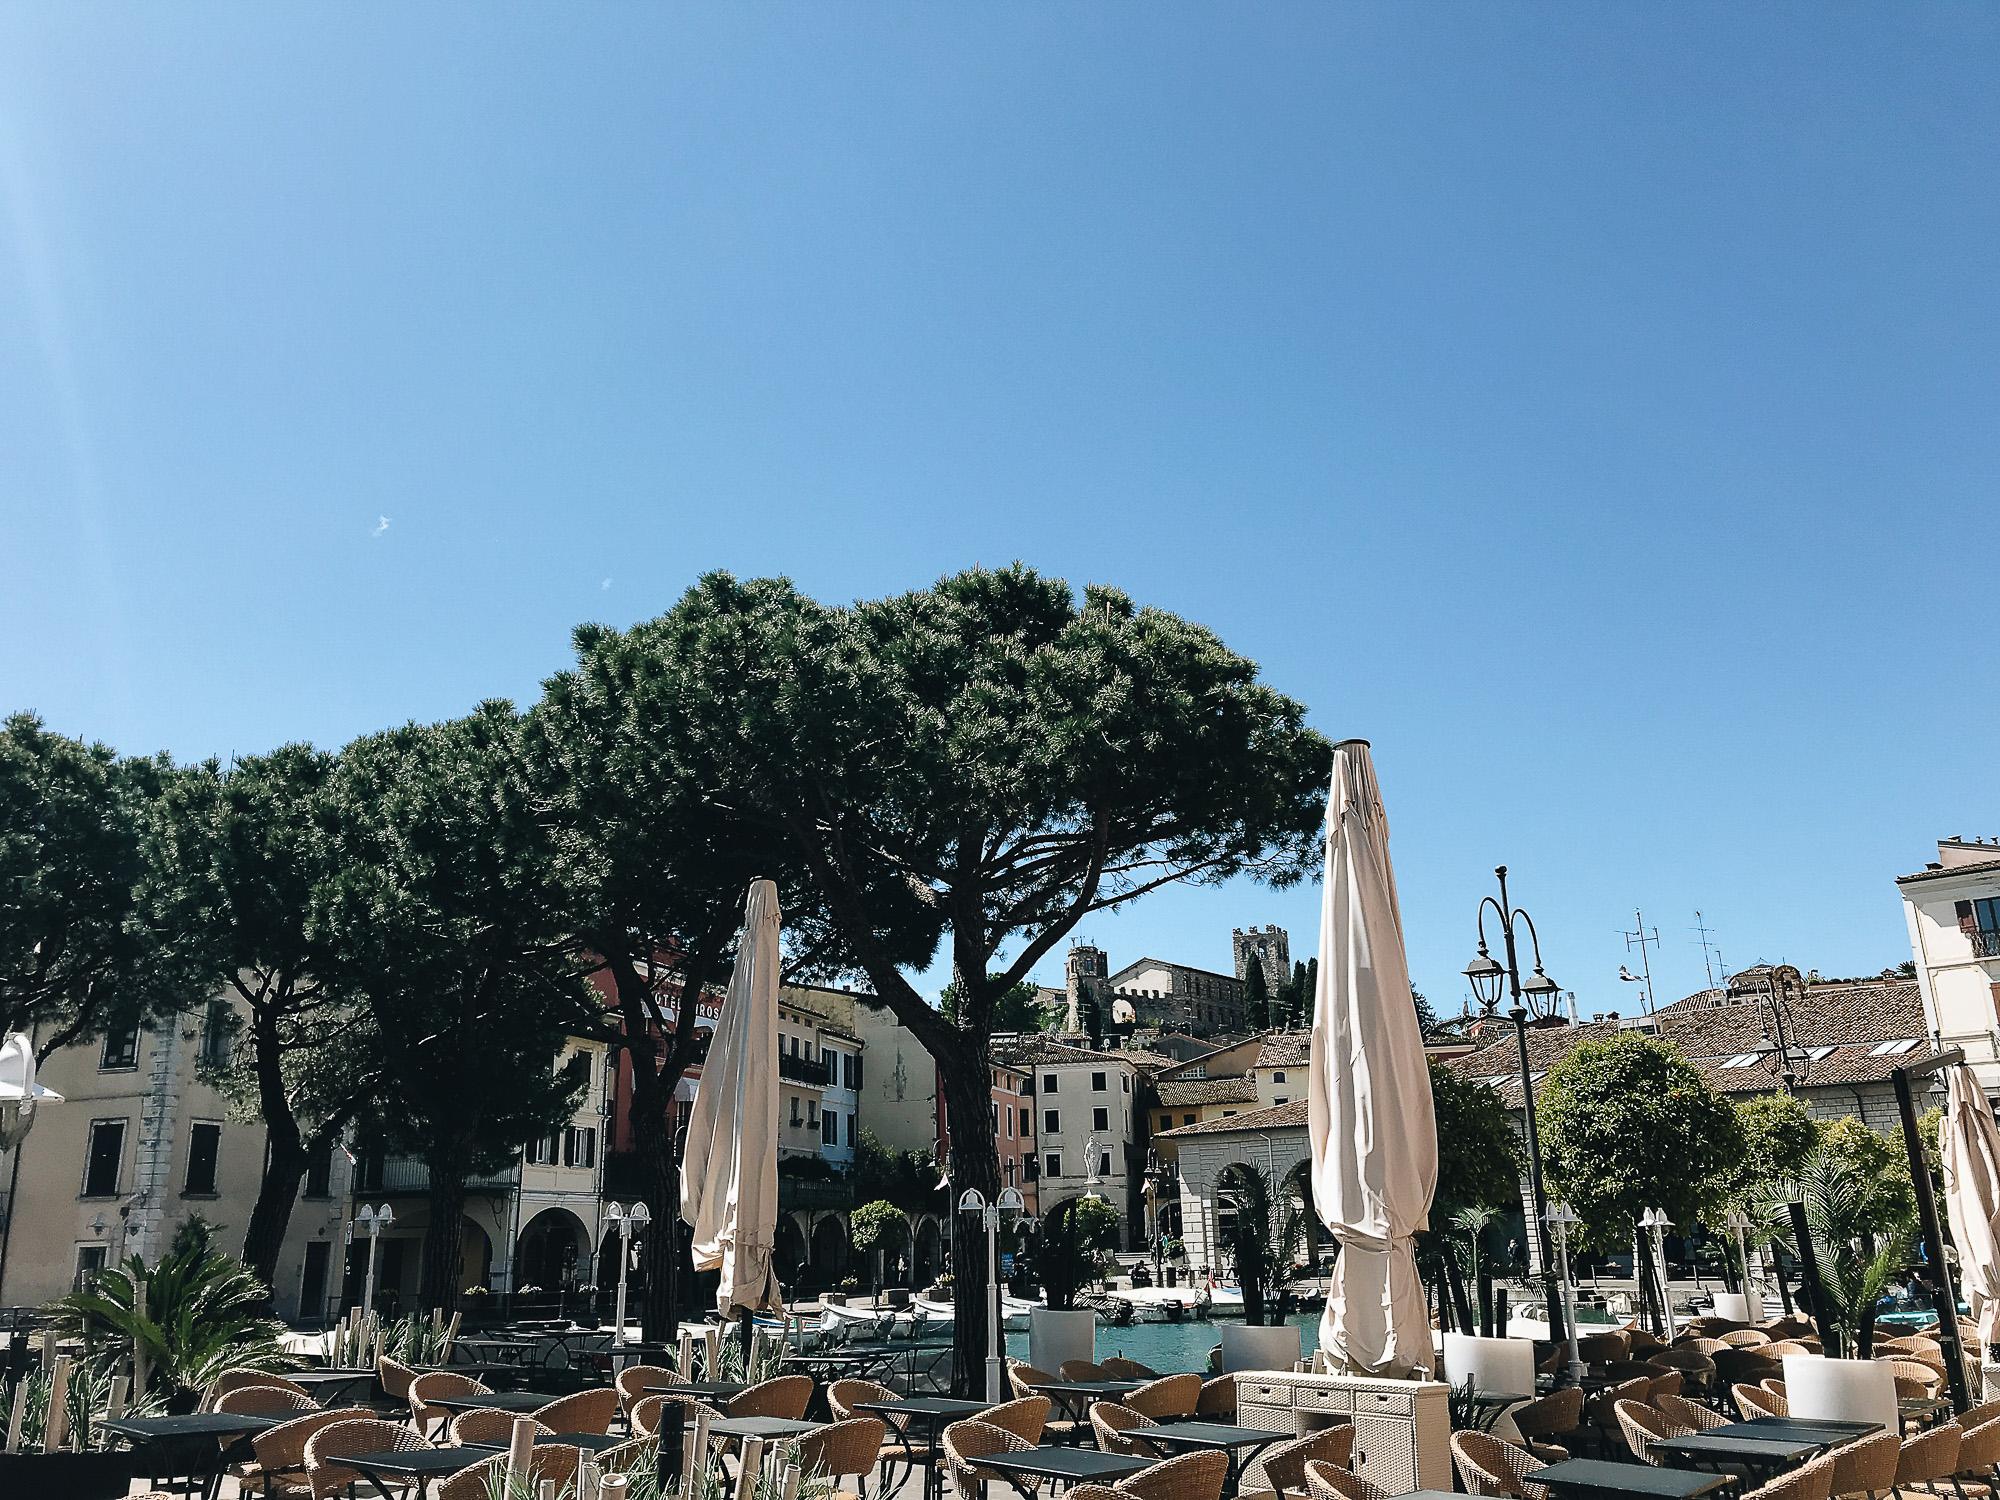 OurBeautifulAdventure-LakeGarda-Italy-Blog-6370.jpg